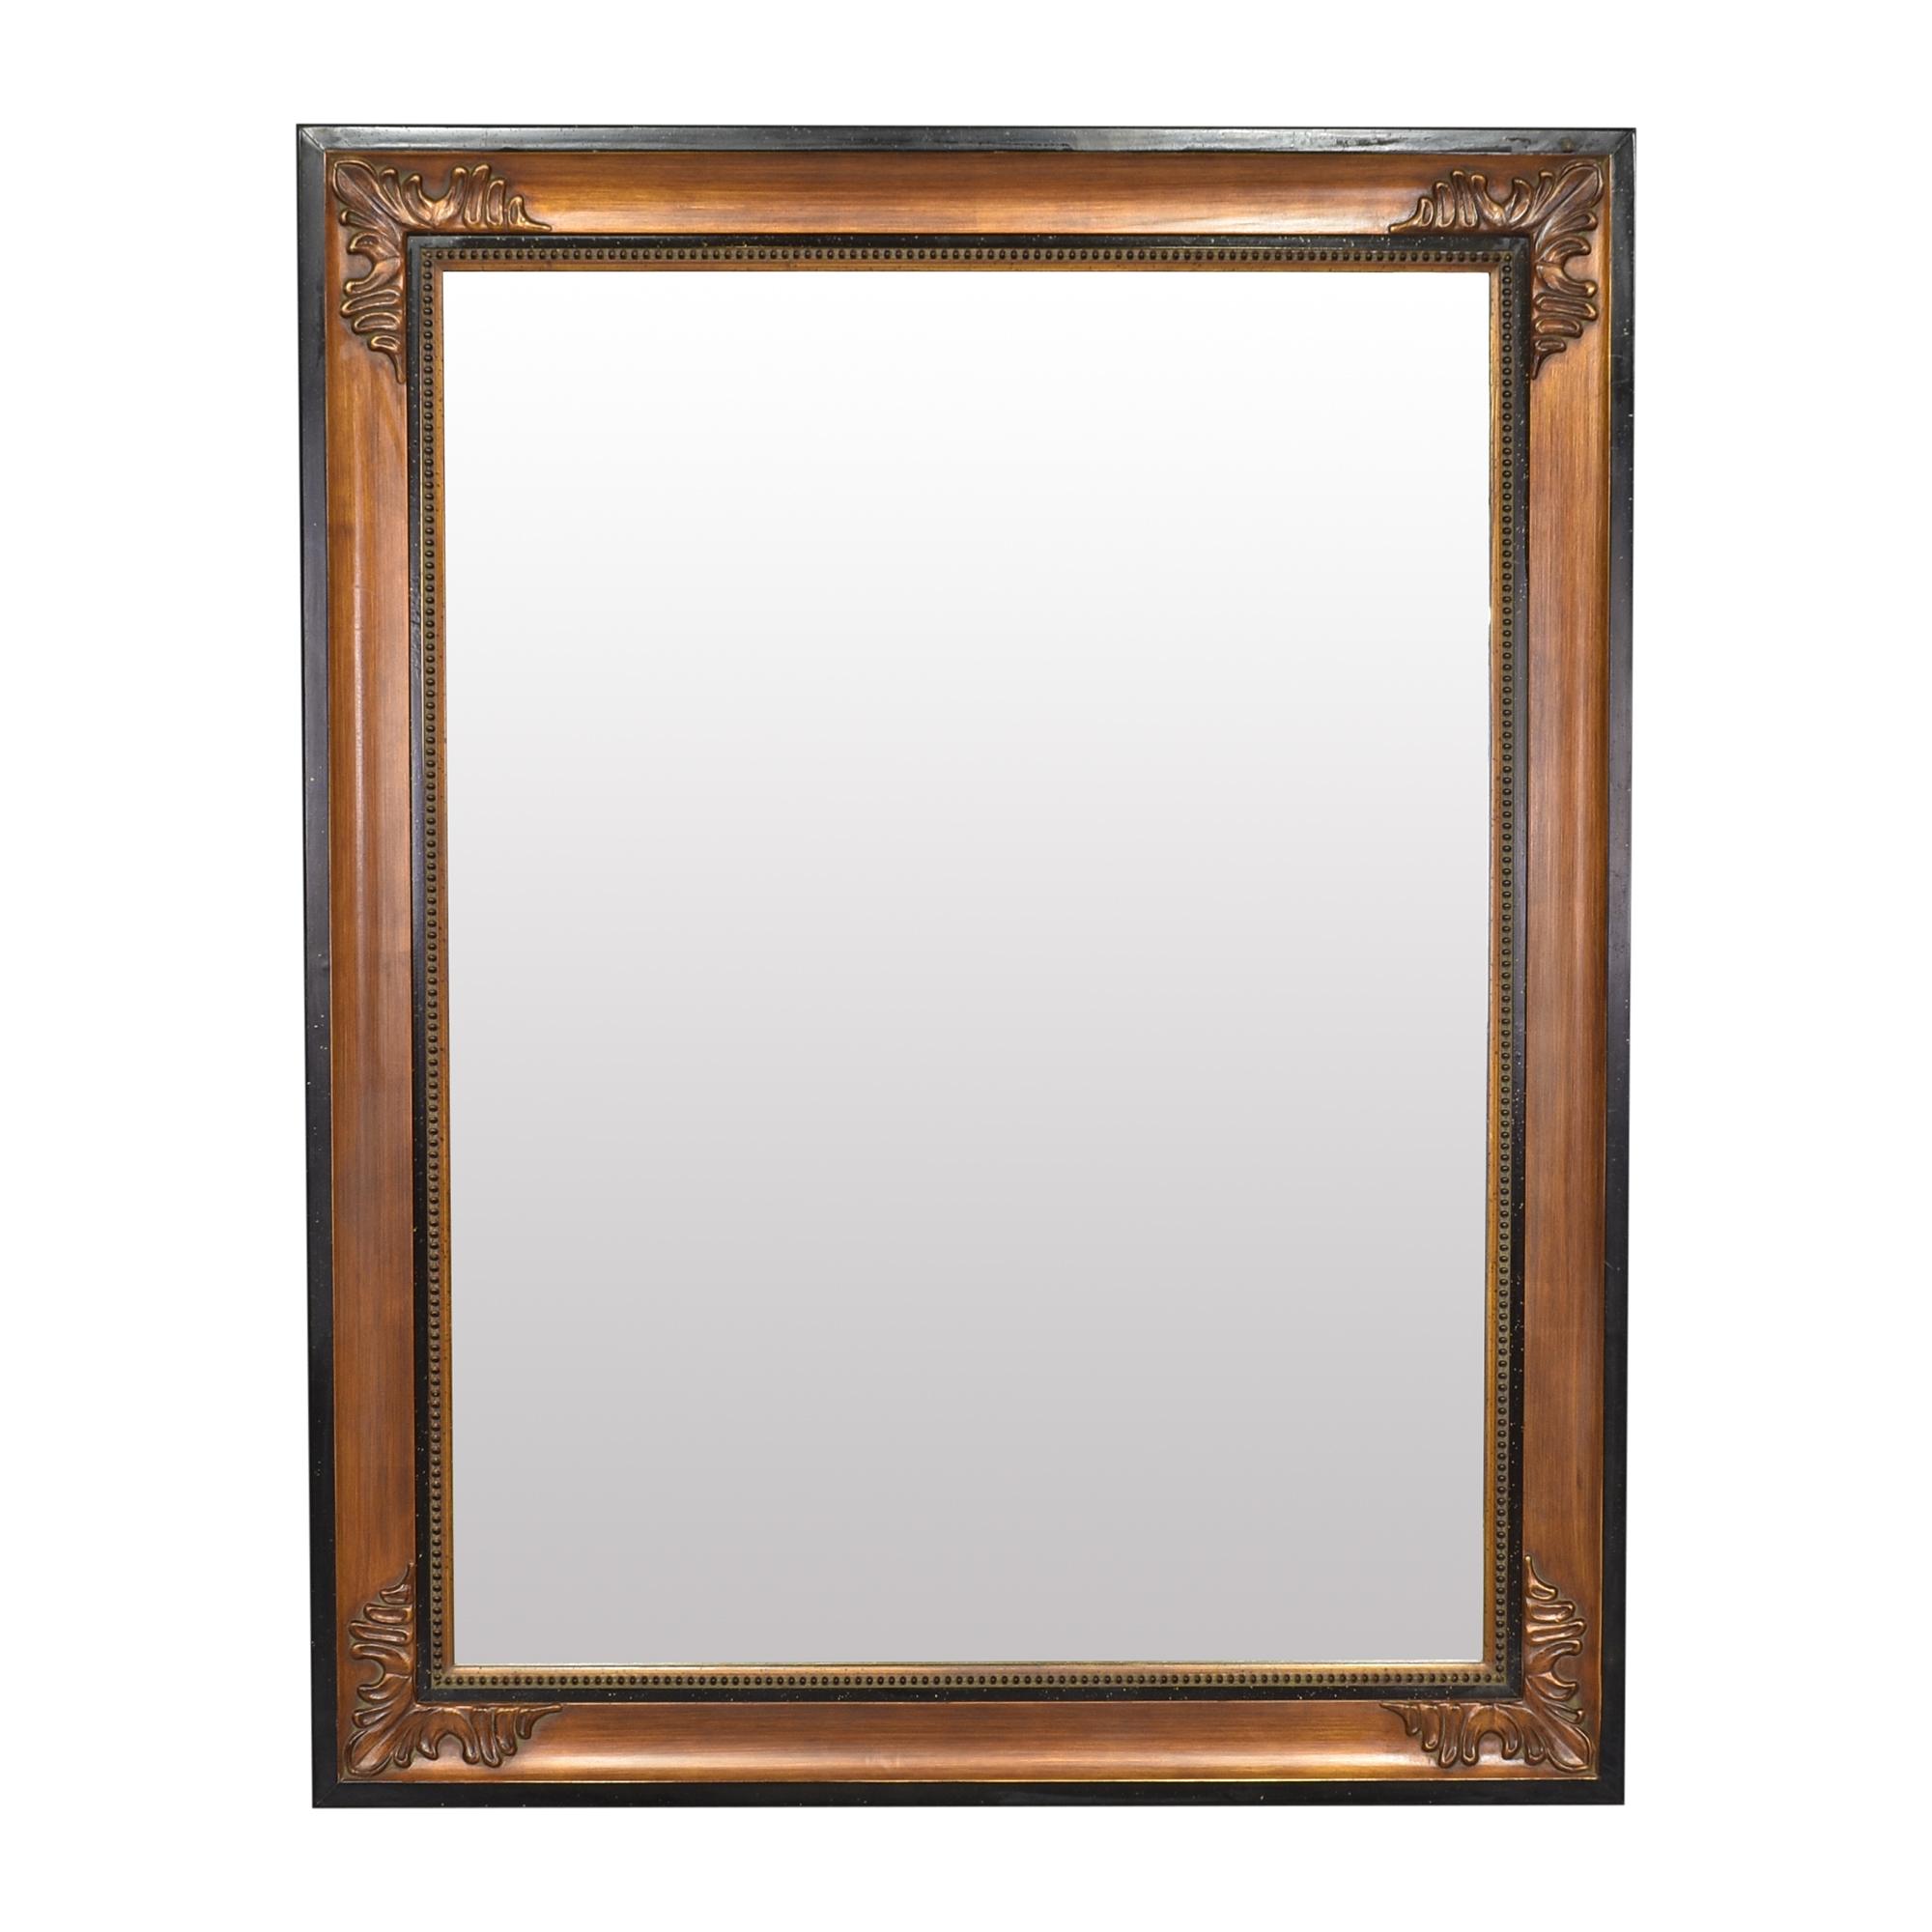 Framed Wall Mirror second hand